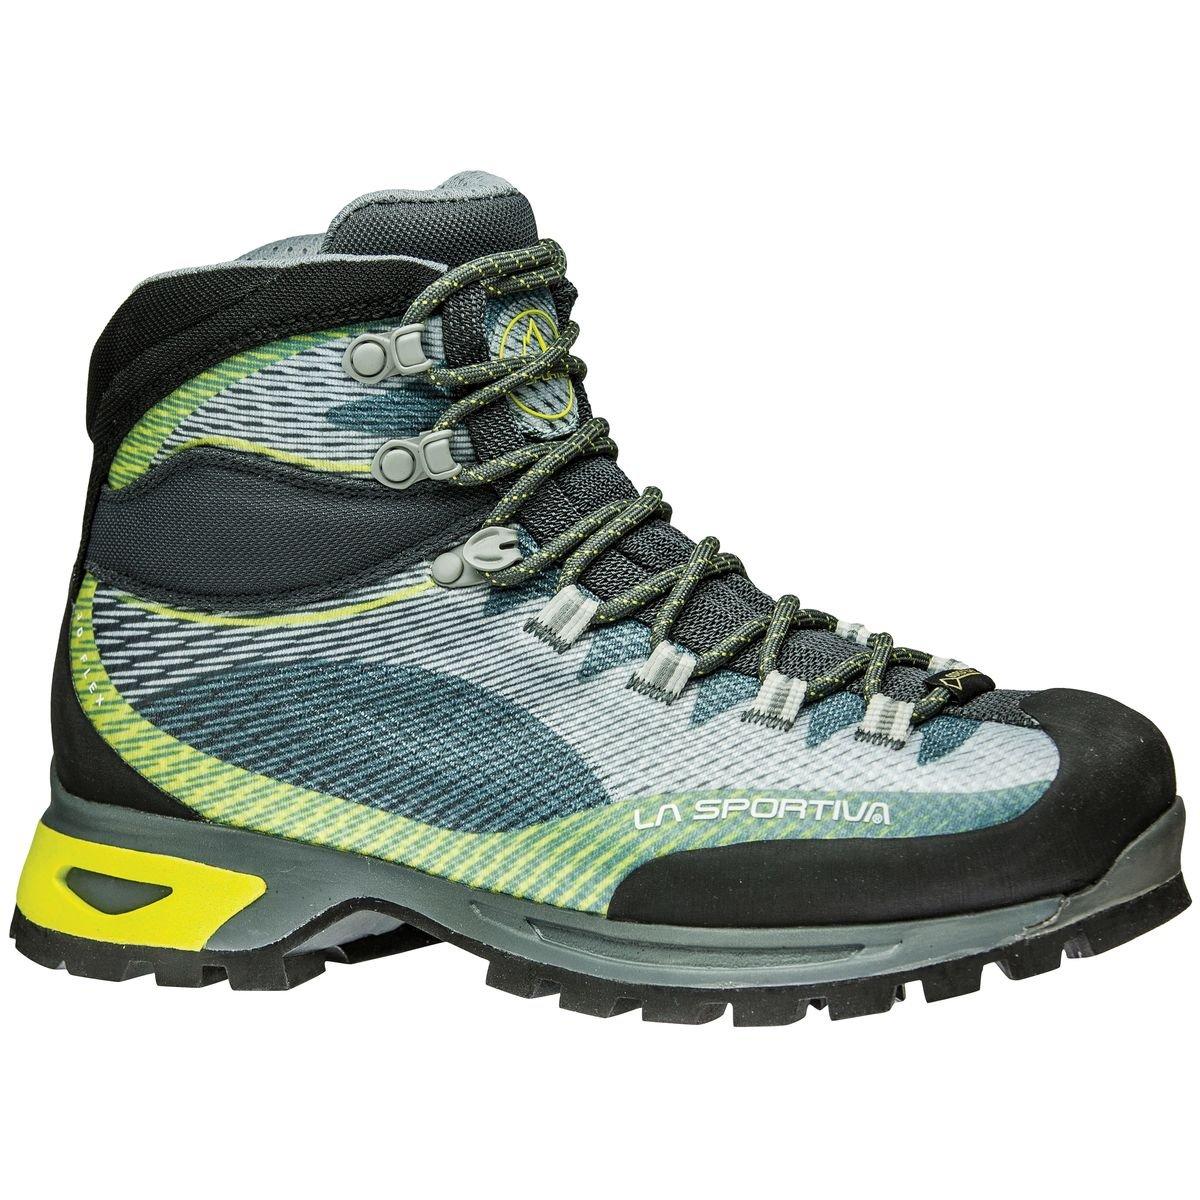 La Sportiva Trango TRK GTX Hiking Shoe - Women's B01015VIJK 39 M EU Greenbay